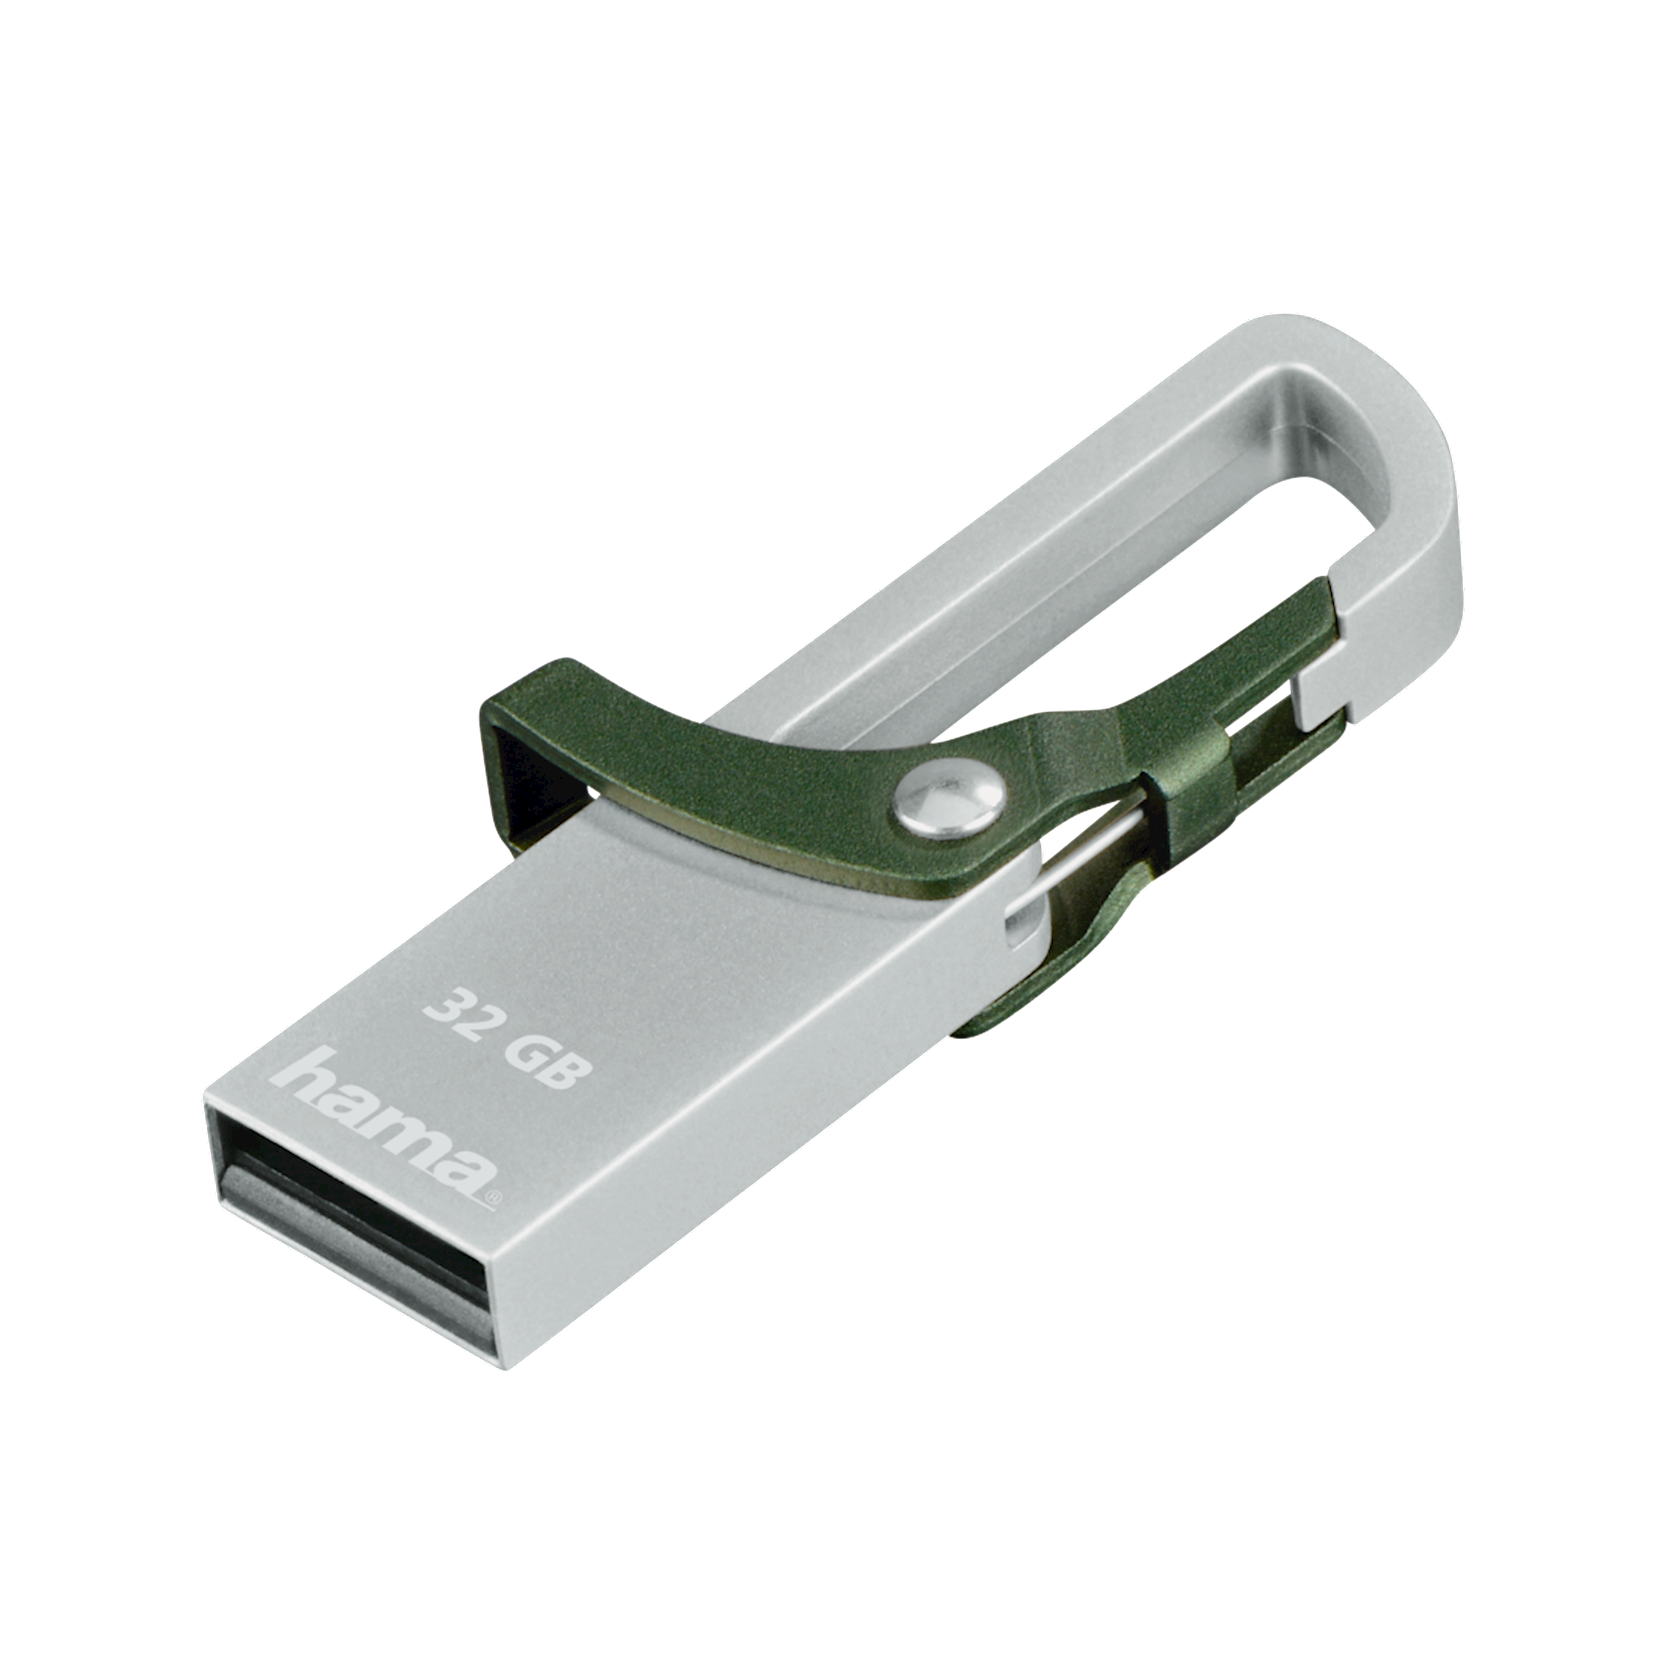 USB-Fleş kart Hama FlashPen Hook-Sty 32 Gb Usb 2.0